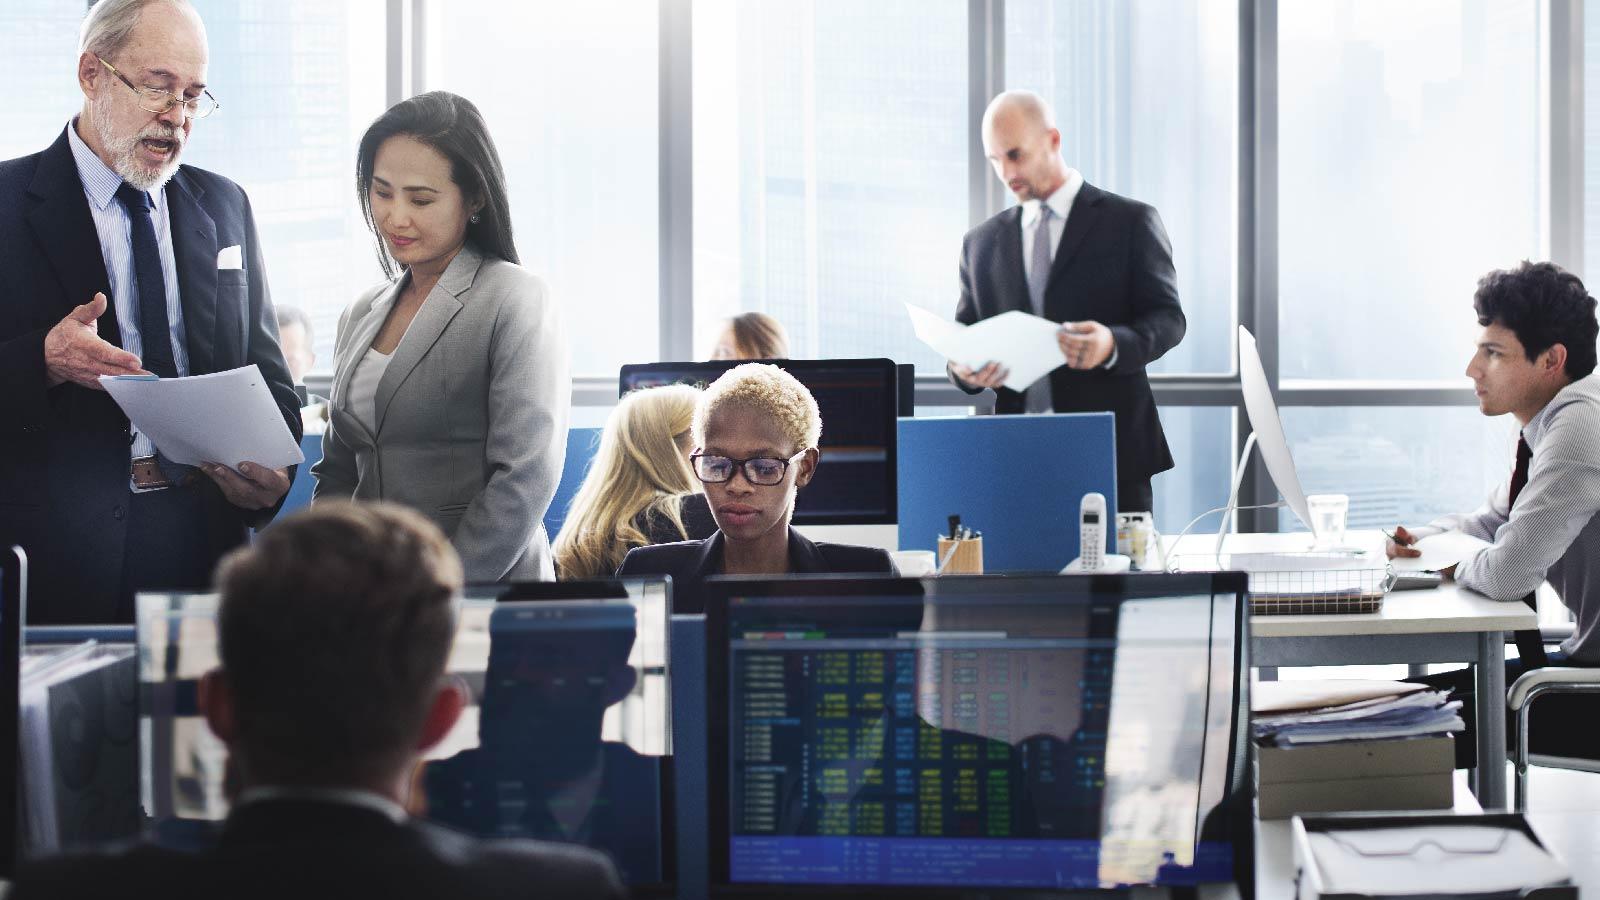 Does future-proofing set enterprises up for future failures